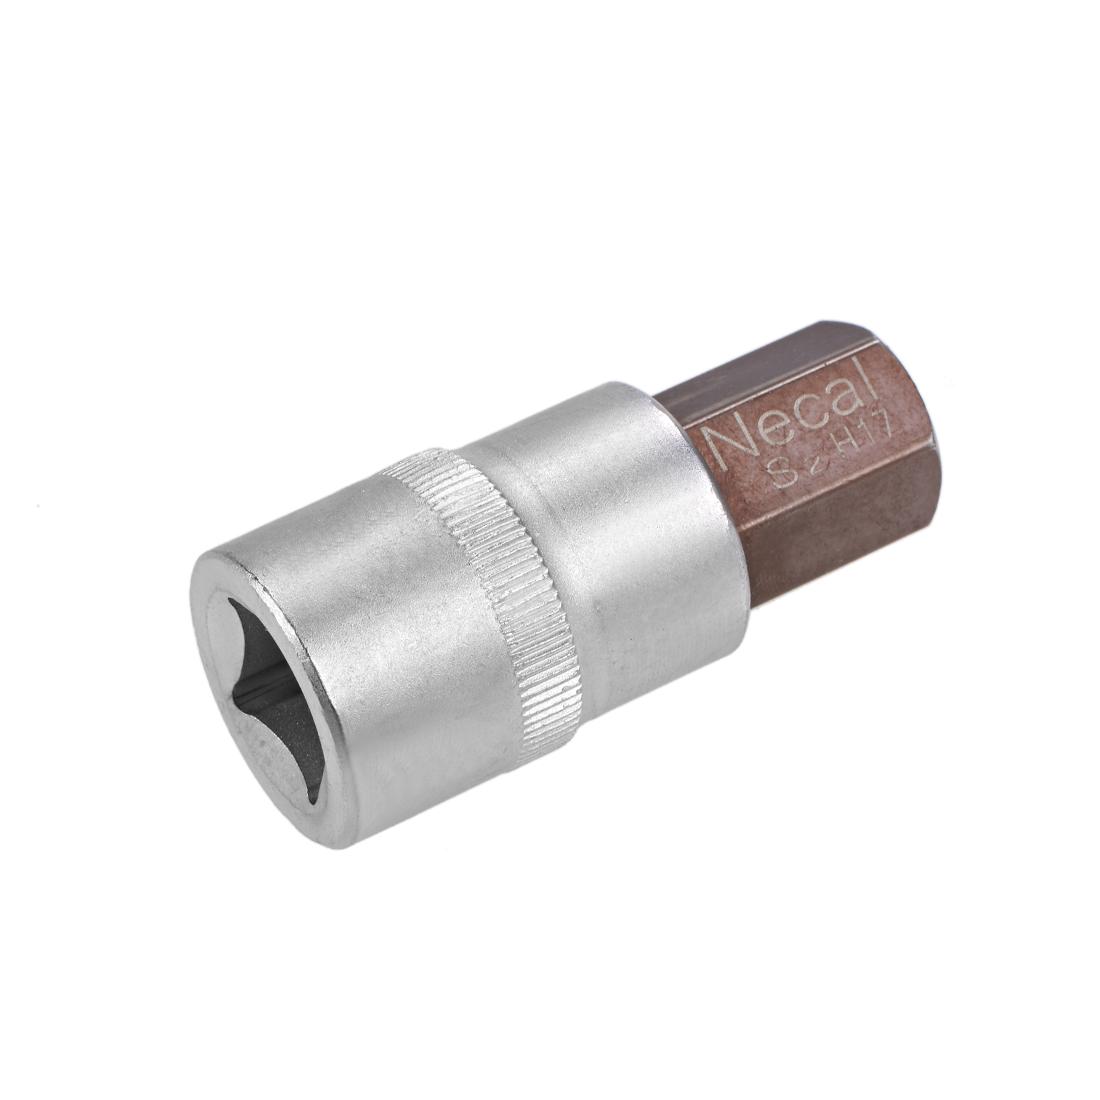 1/2-inch Drive H17(17mm) Hex Bit Socket, Heat Treated CR-V Steel Sockets and S2